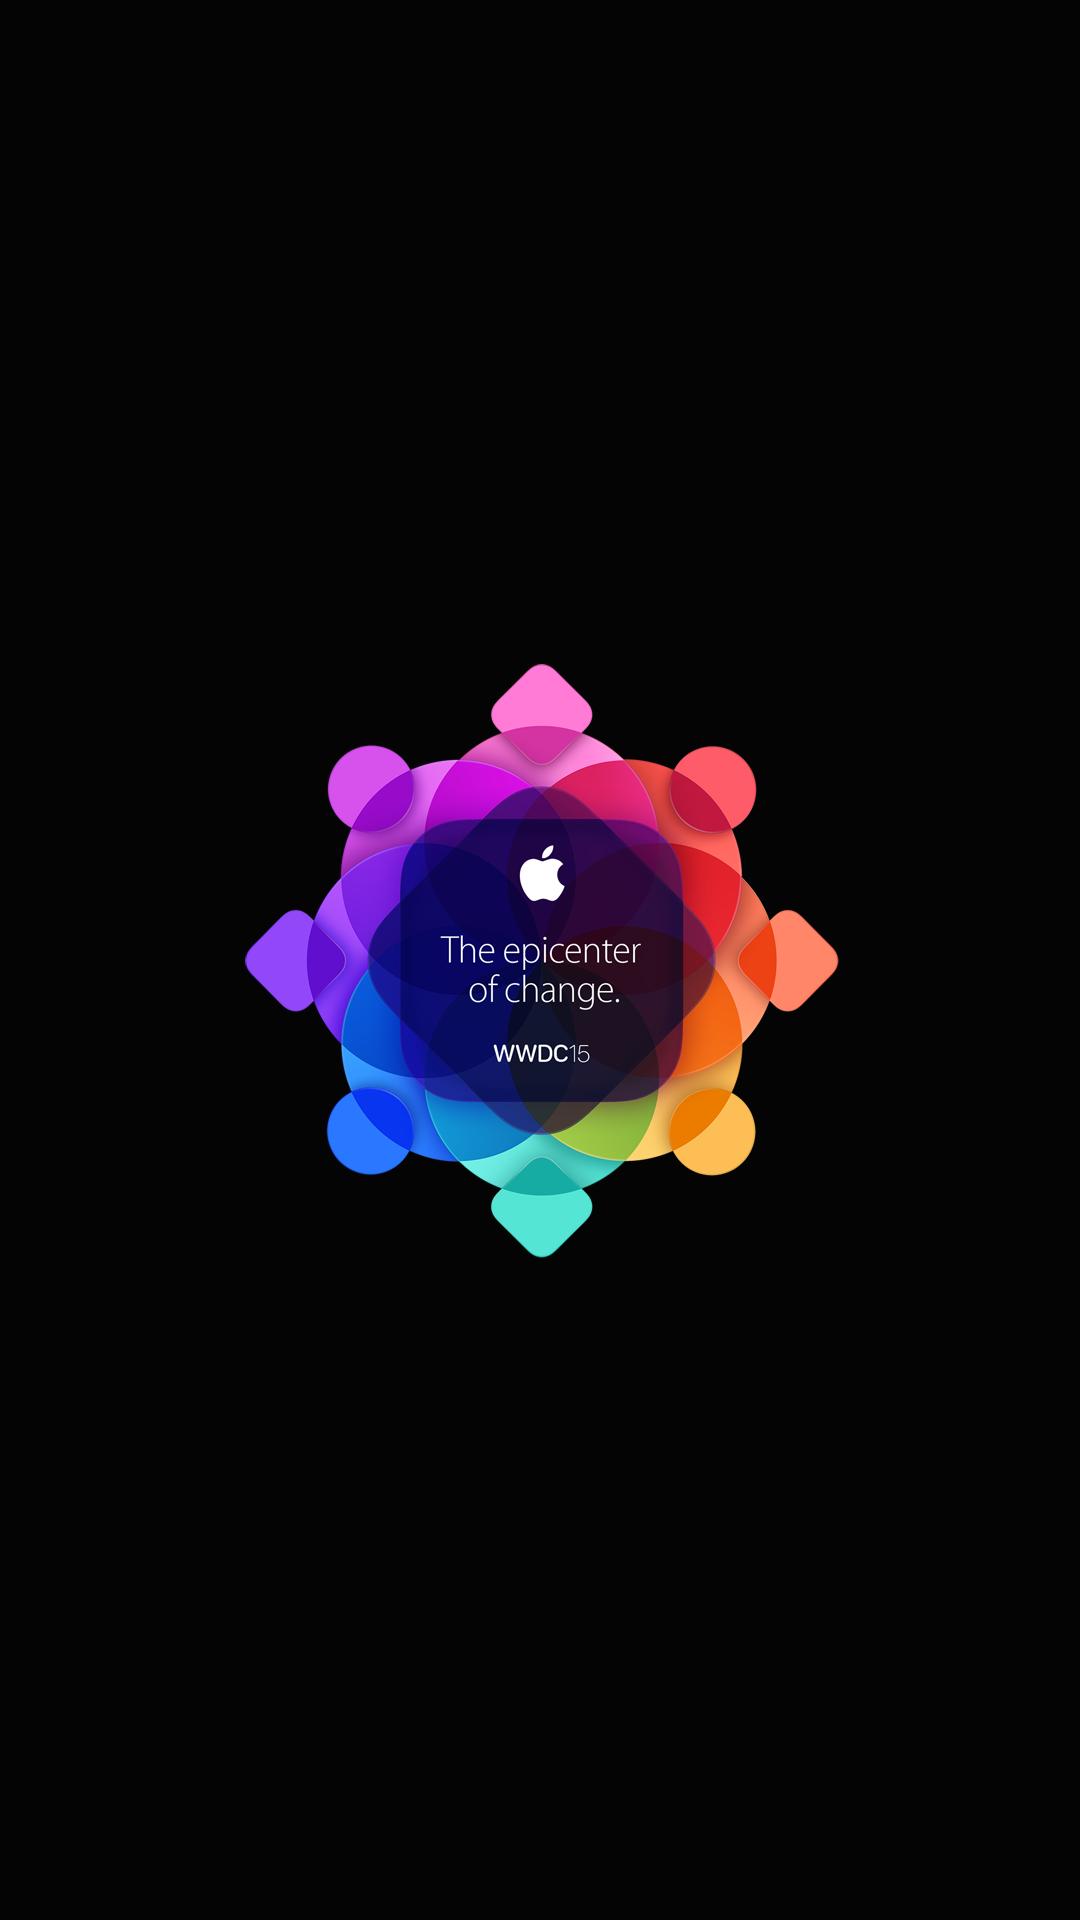 Der iPhone 6 Plus Wallpaper Thread-wwdc-2015-wallpaper-iphone-6-plus ...